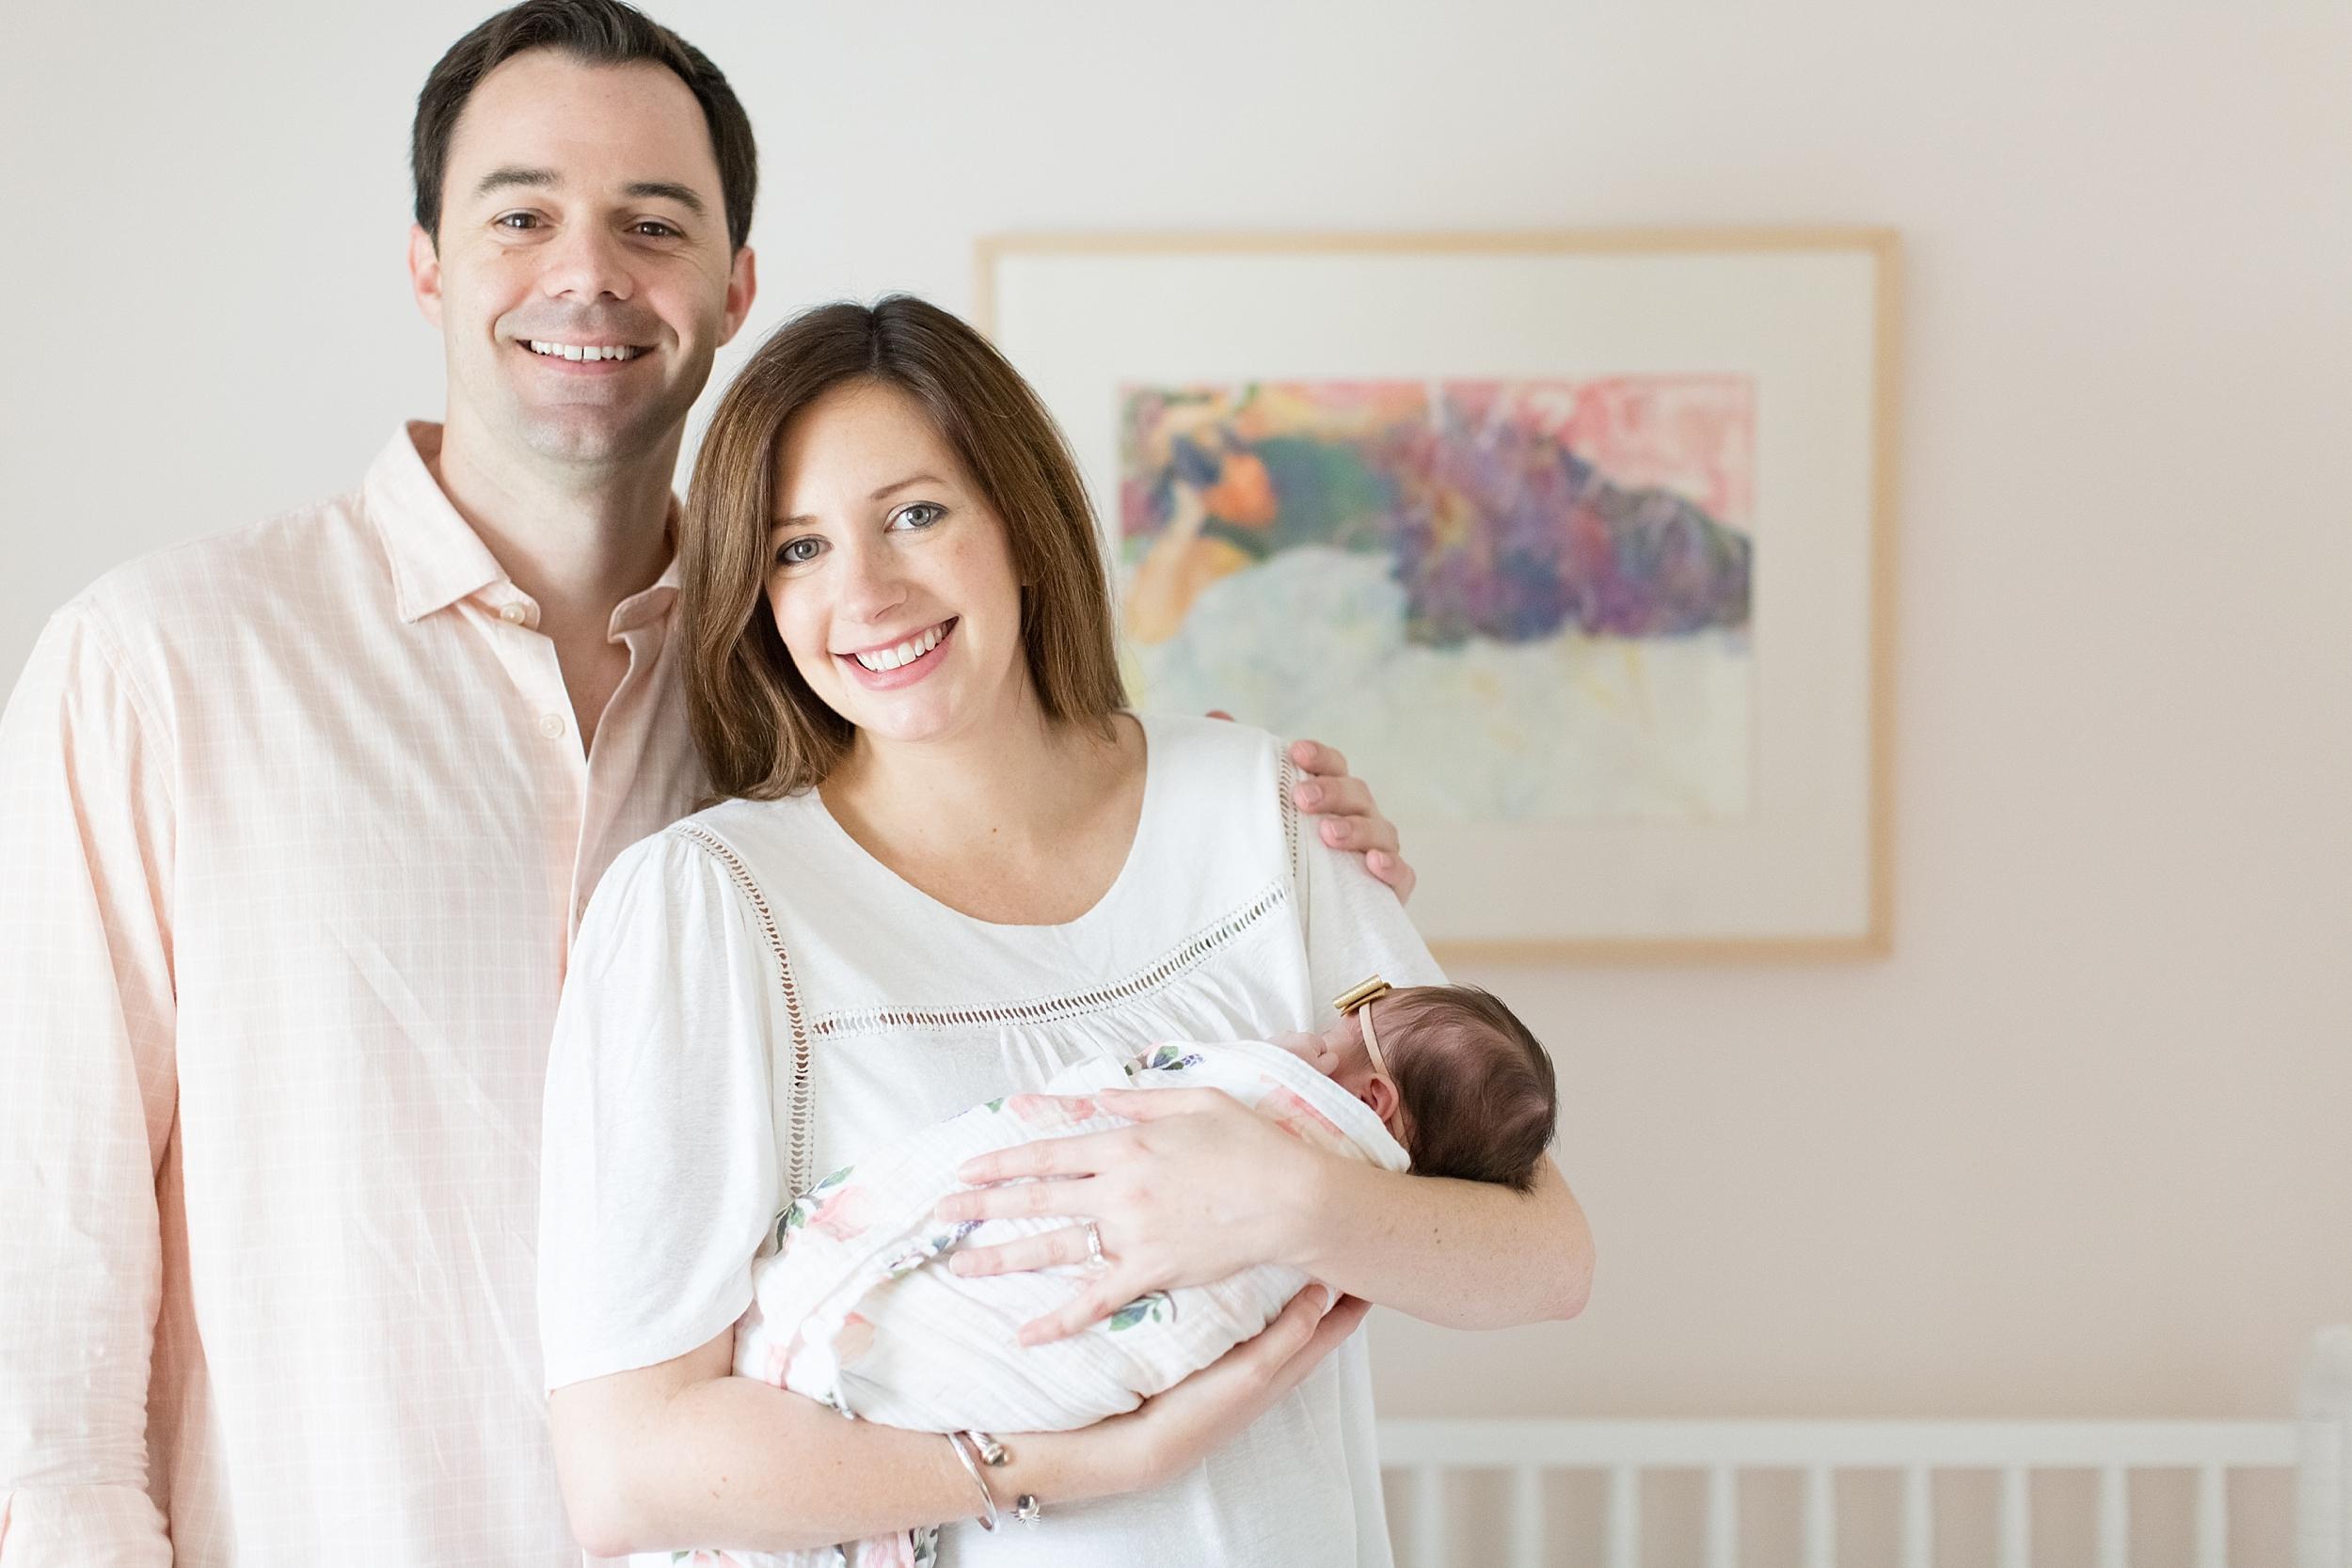 Landon-Schneider-Photography-Newborn-Session-Texas_0006.jpg